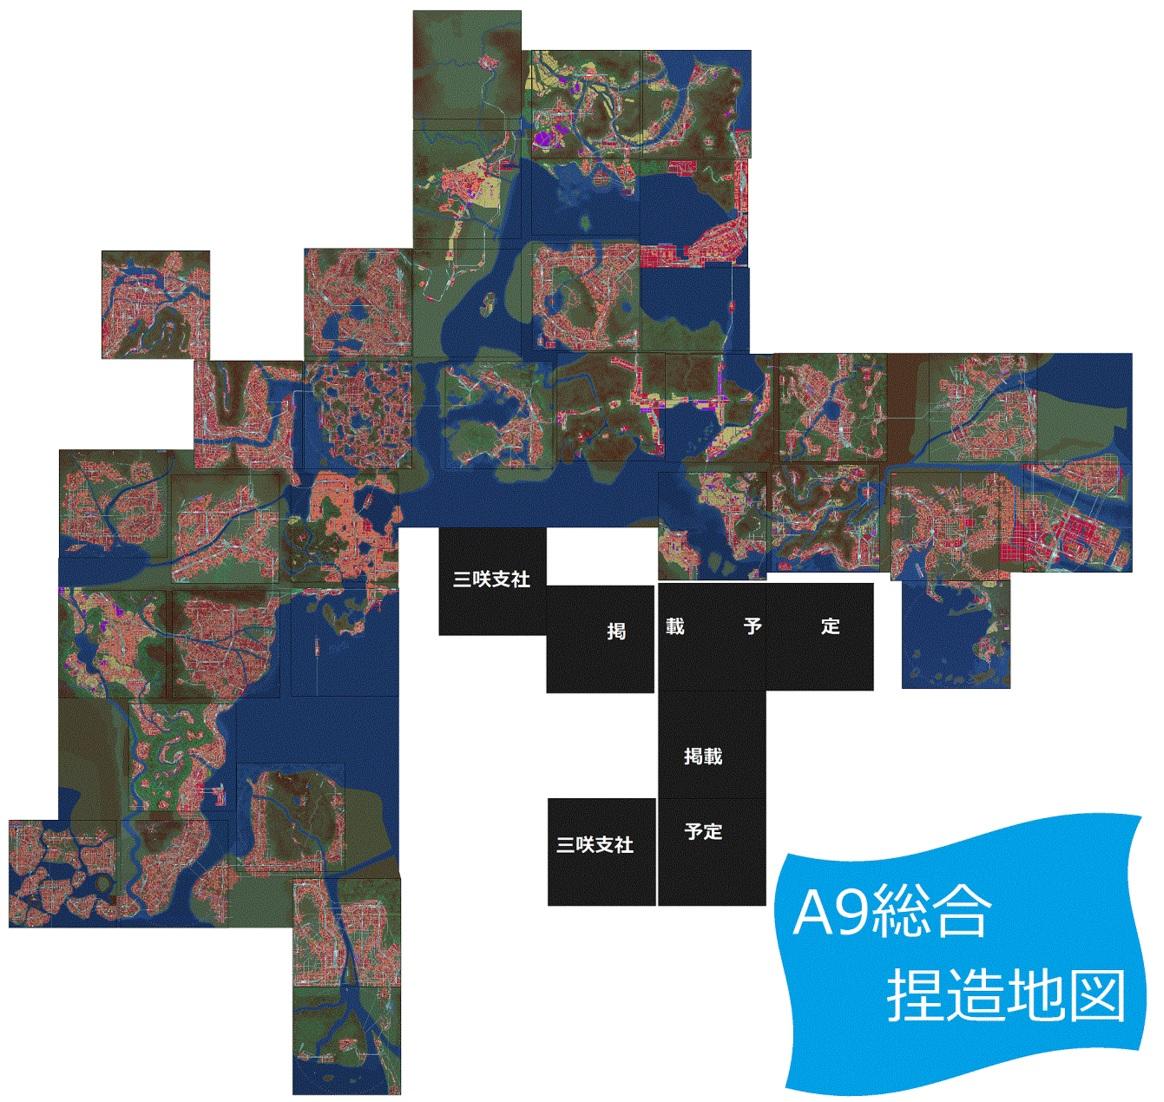 A9総合地図.jpg